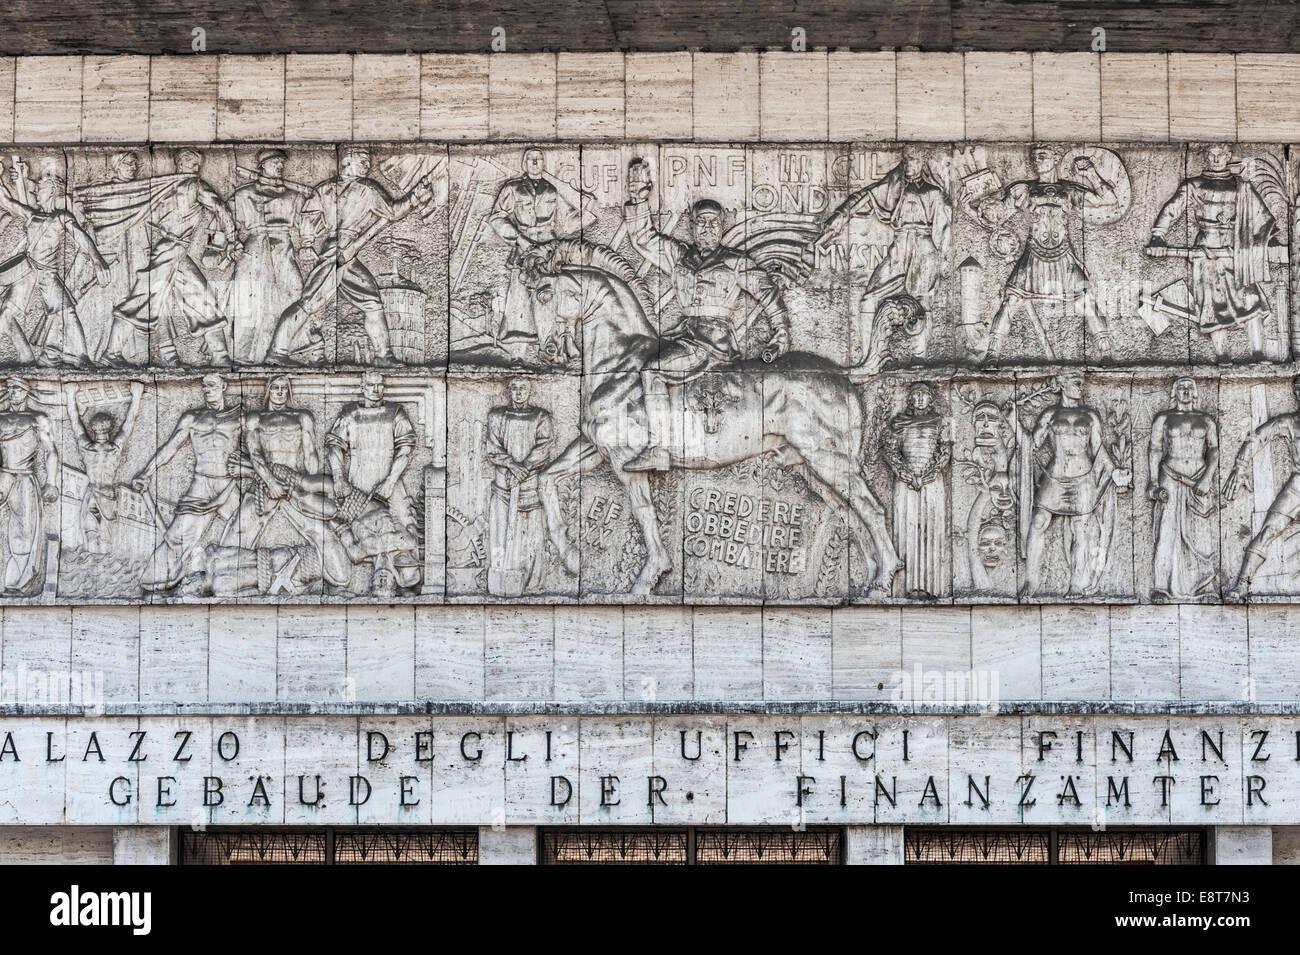 Monumental frieze, Mussolini as a Roman emperor on horseback, Casa del Fascio former party headquarters of the fascists - Stock Image